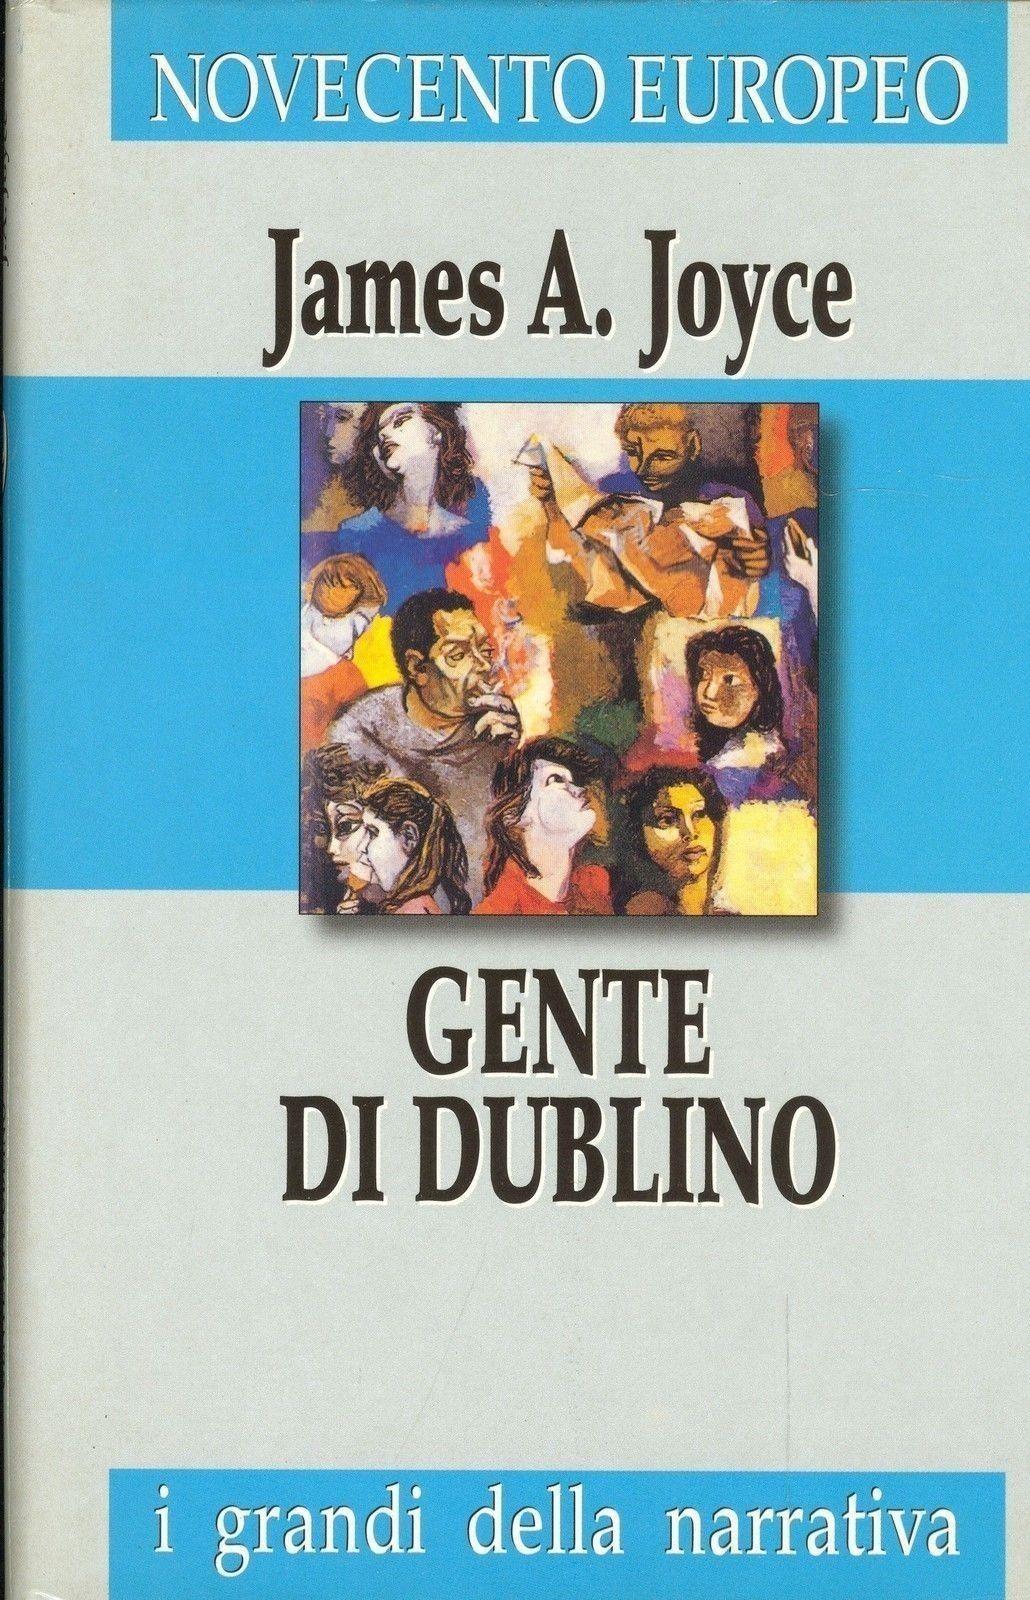 GENTE DI DUBLINO - JAMES A. JOYCE